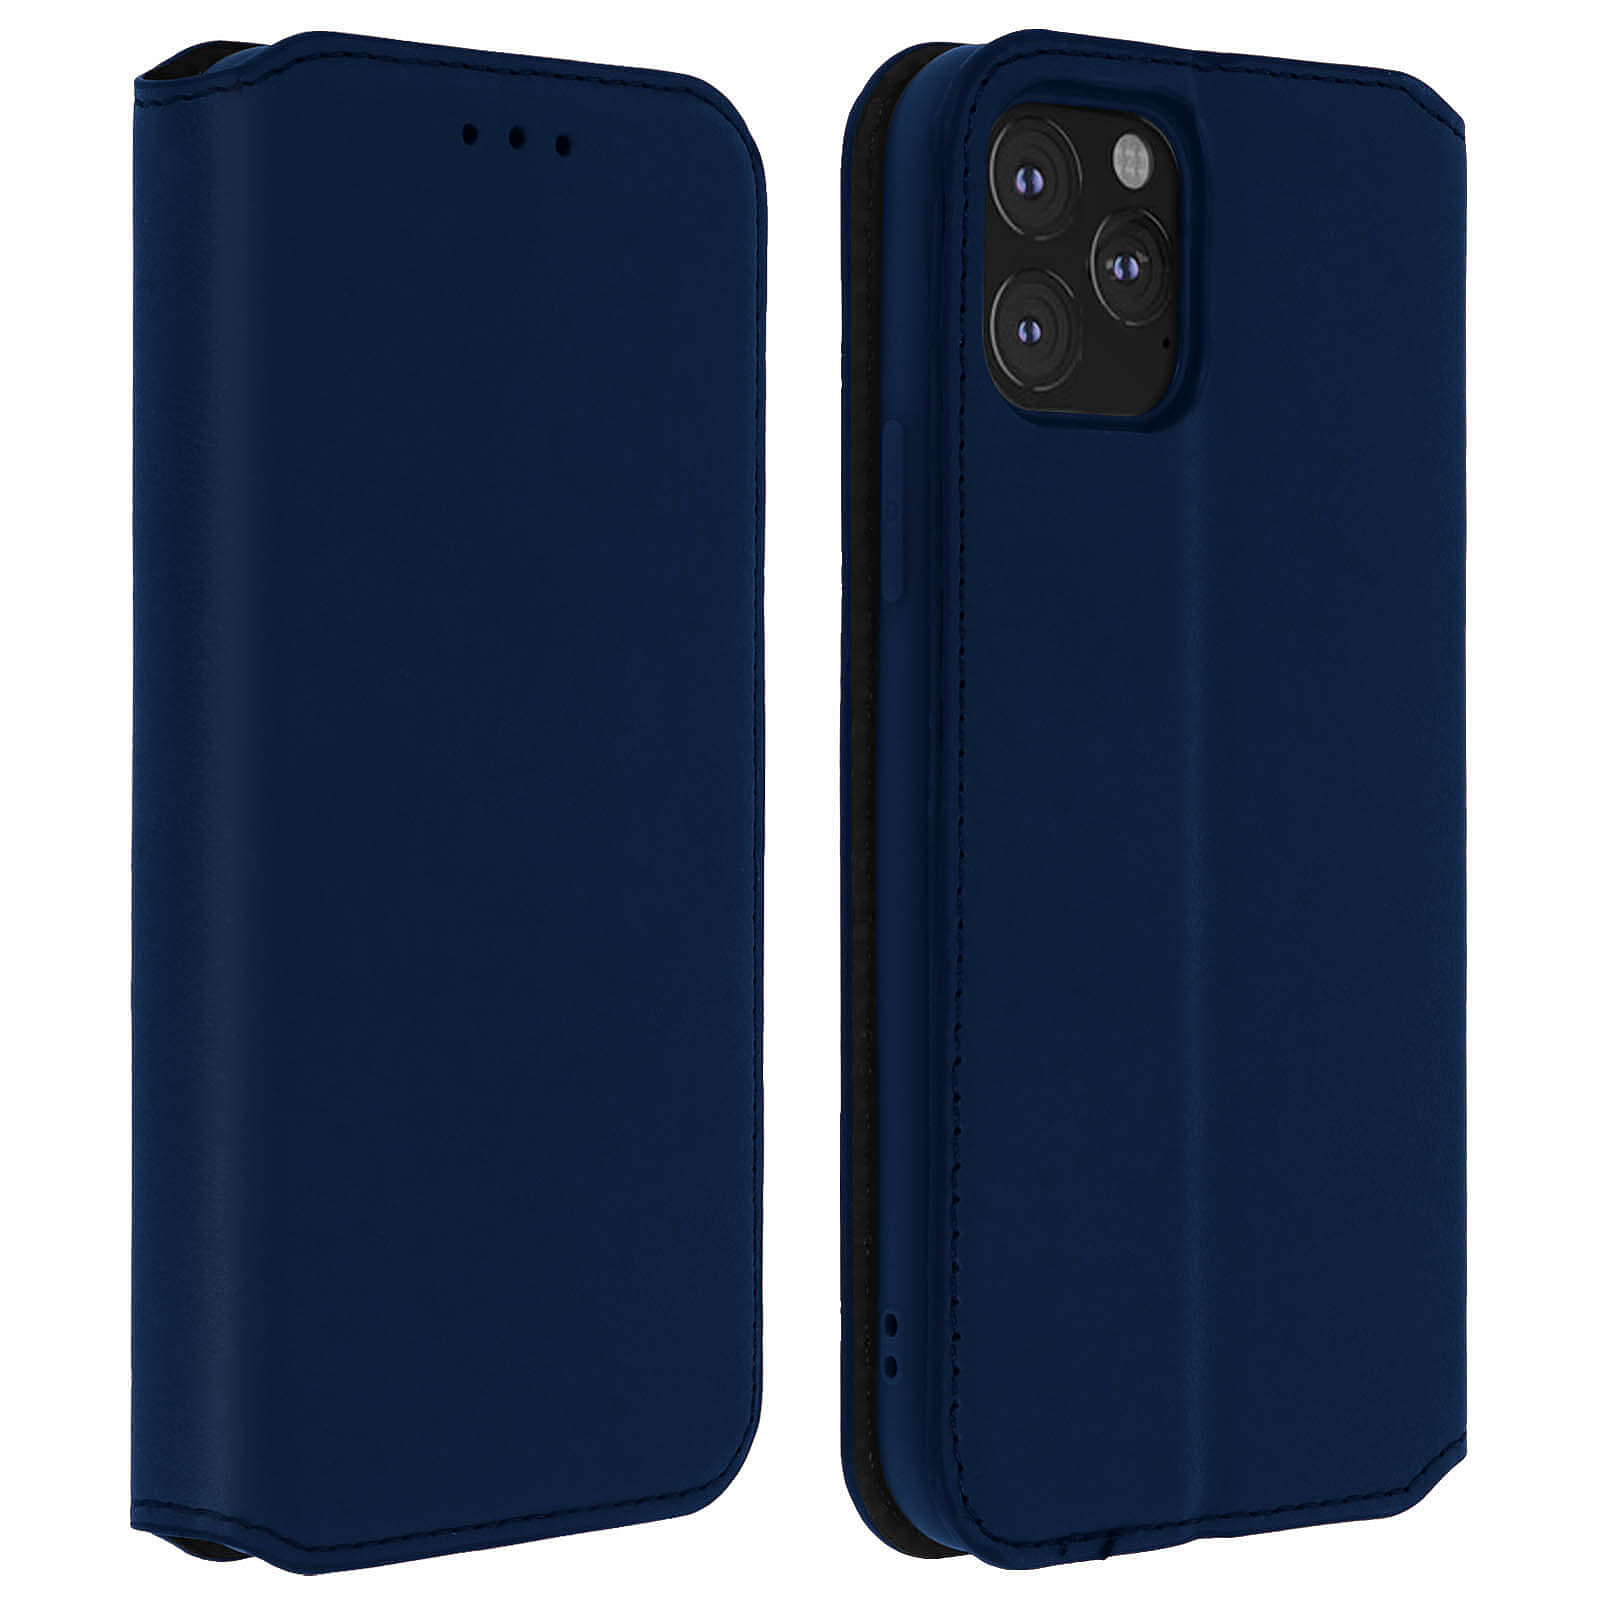 Avizar Etui folio Bleu Nuit pour Apple iPhone 11 Pro Max